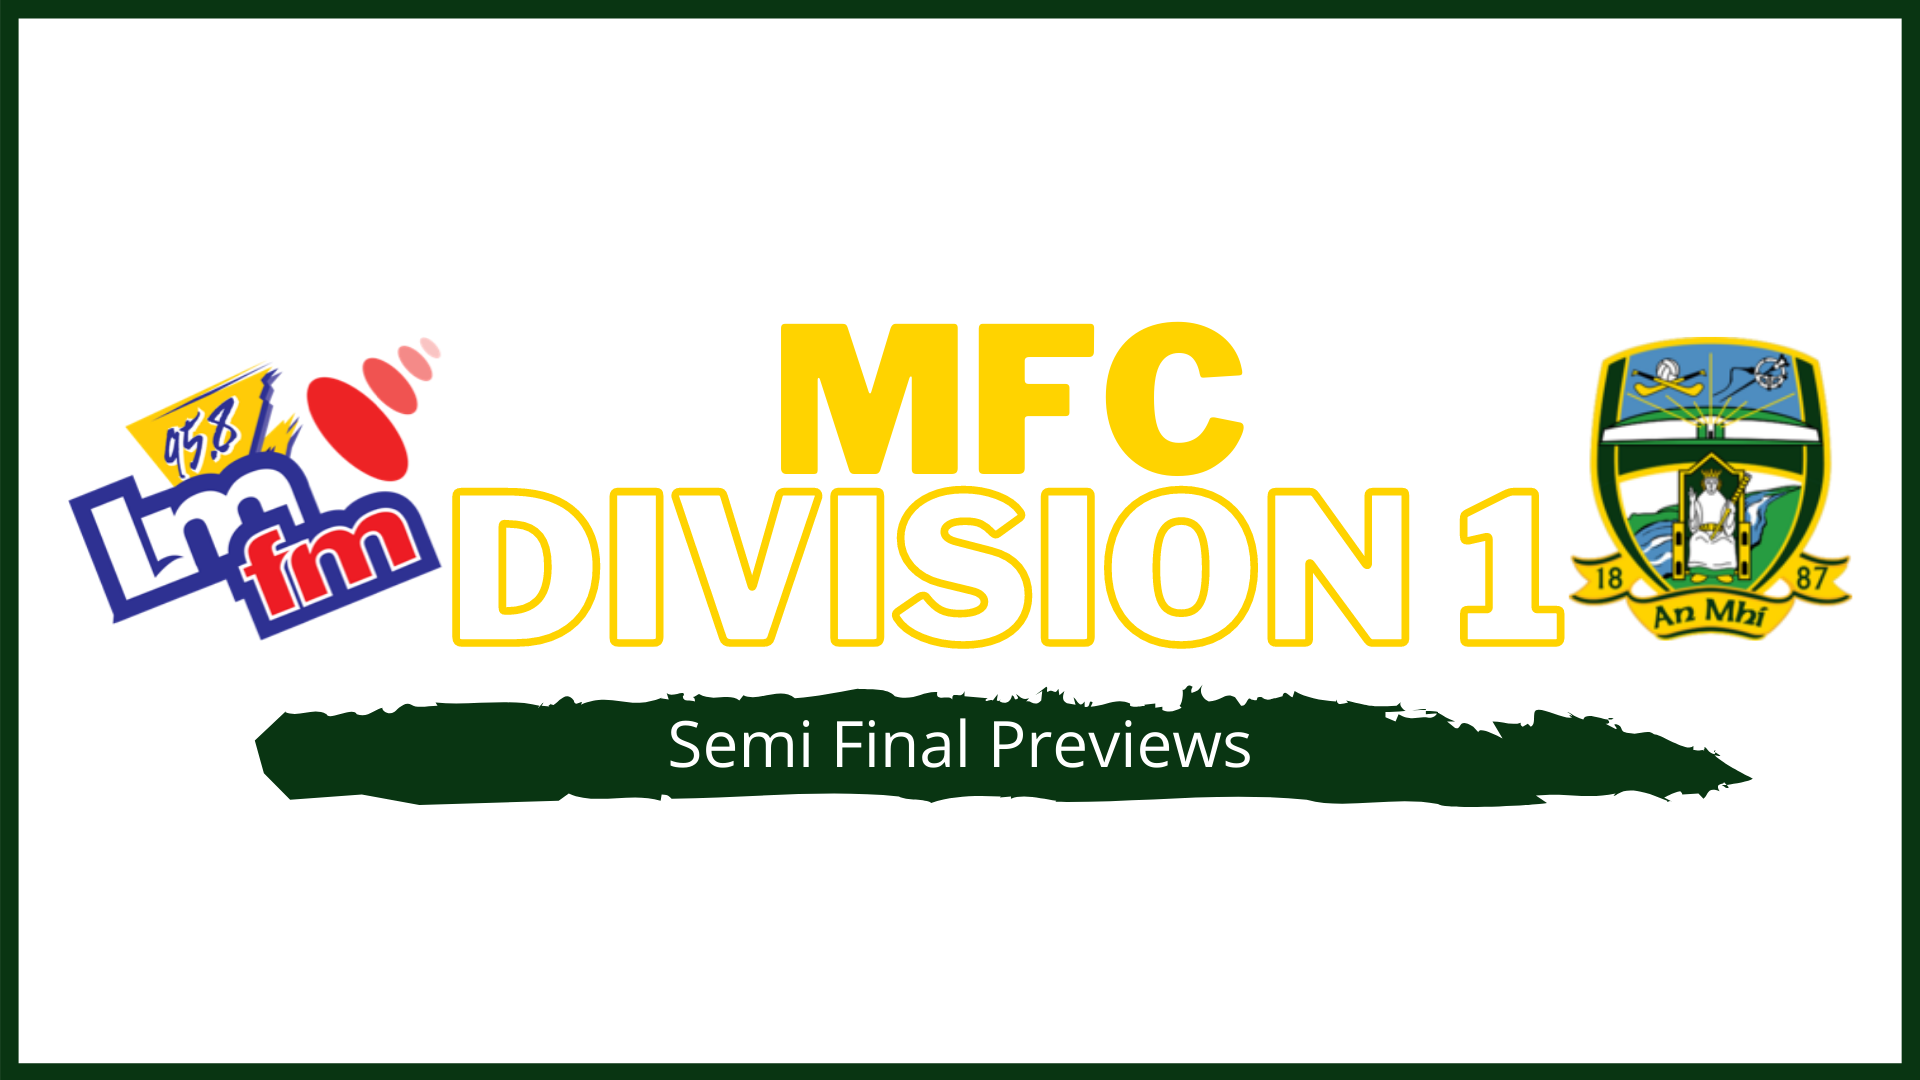 LMFM MFC Division 1 Semi-Final Previews